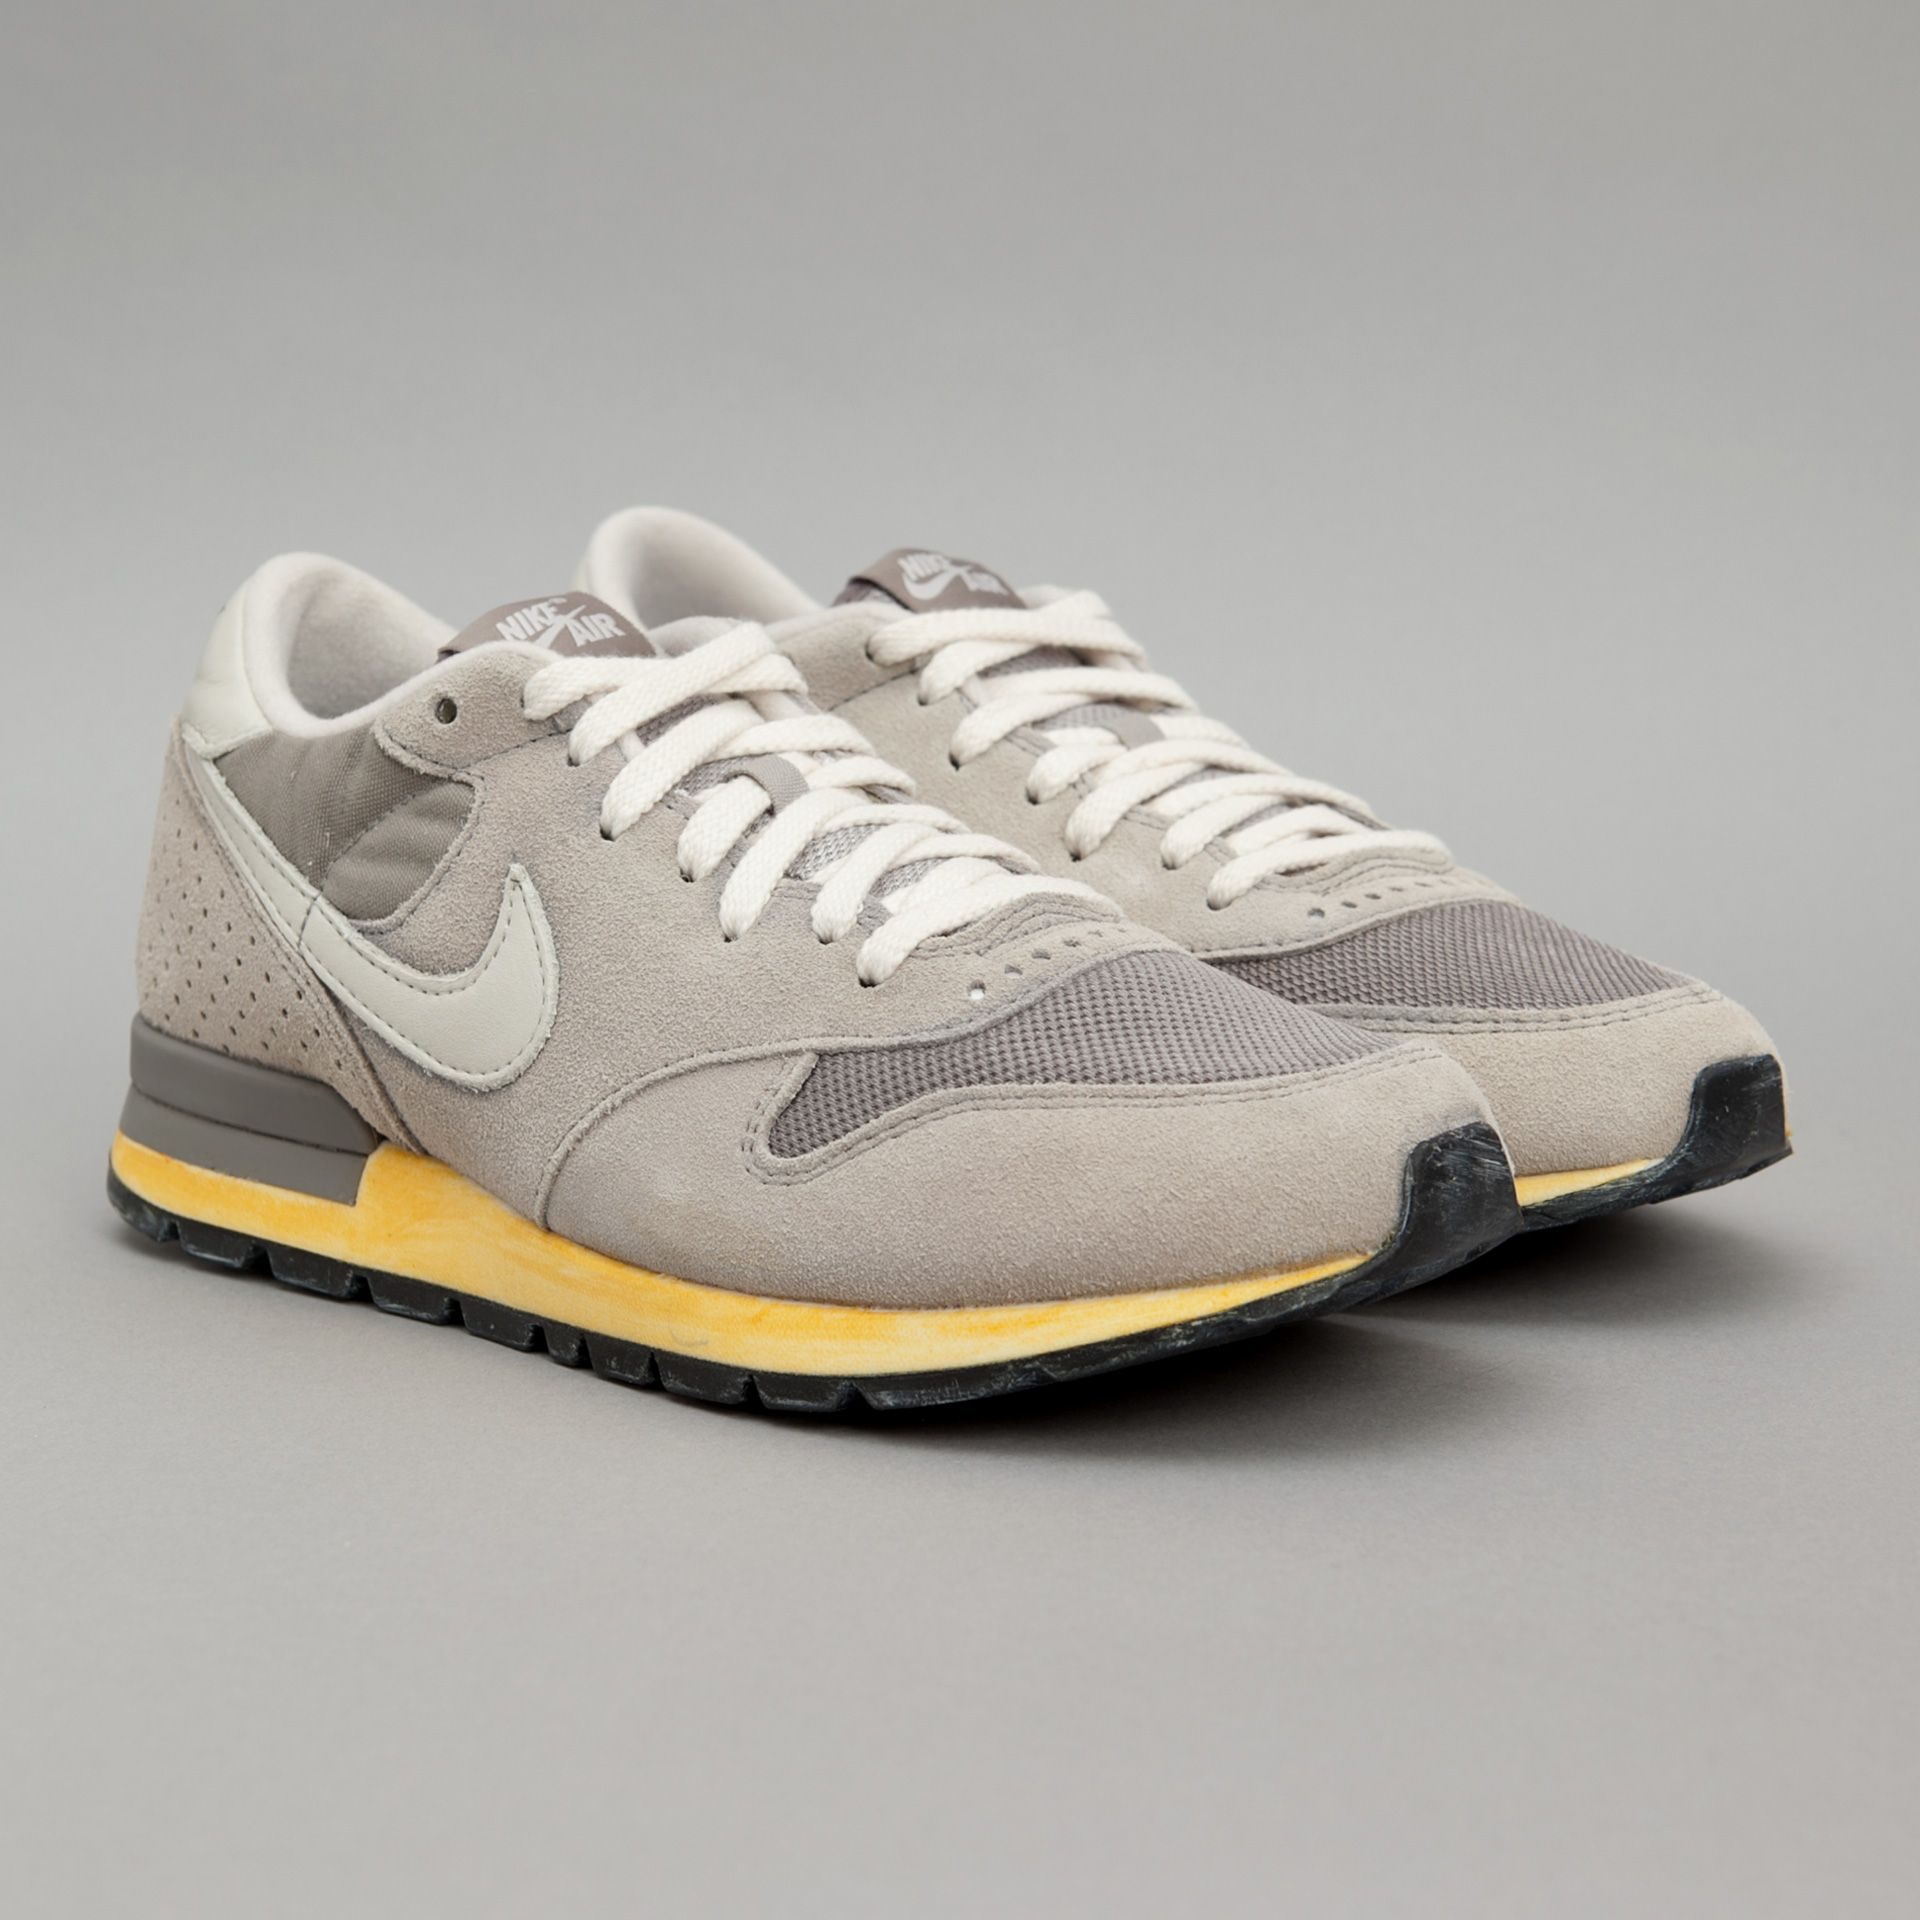 solamente proteccion Hacer bien  Nike Air Epic Vintage QS (Soft Grey / Light Bone) | Oi Polloi | Nike free  shoes, Cheap nike air max, Nike outlet